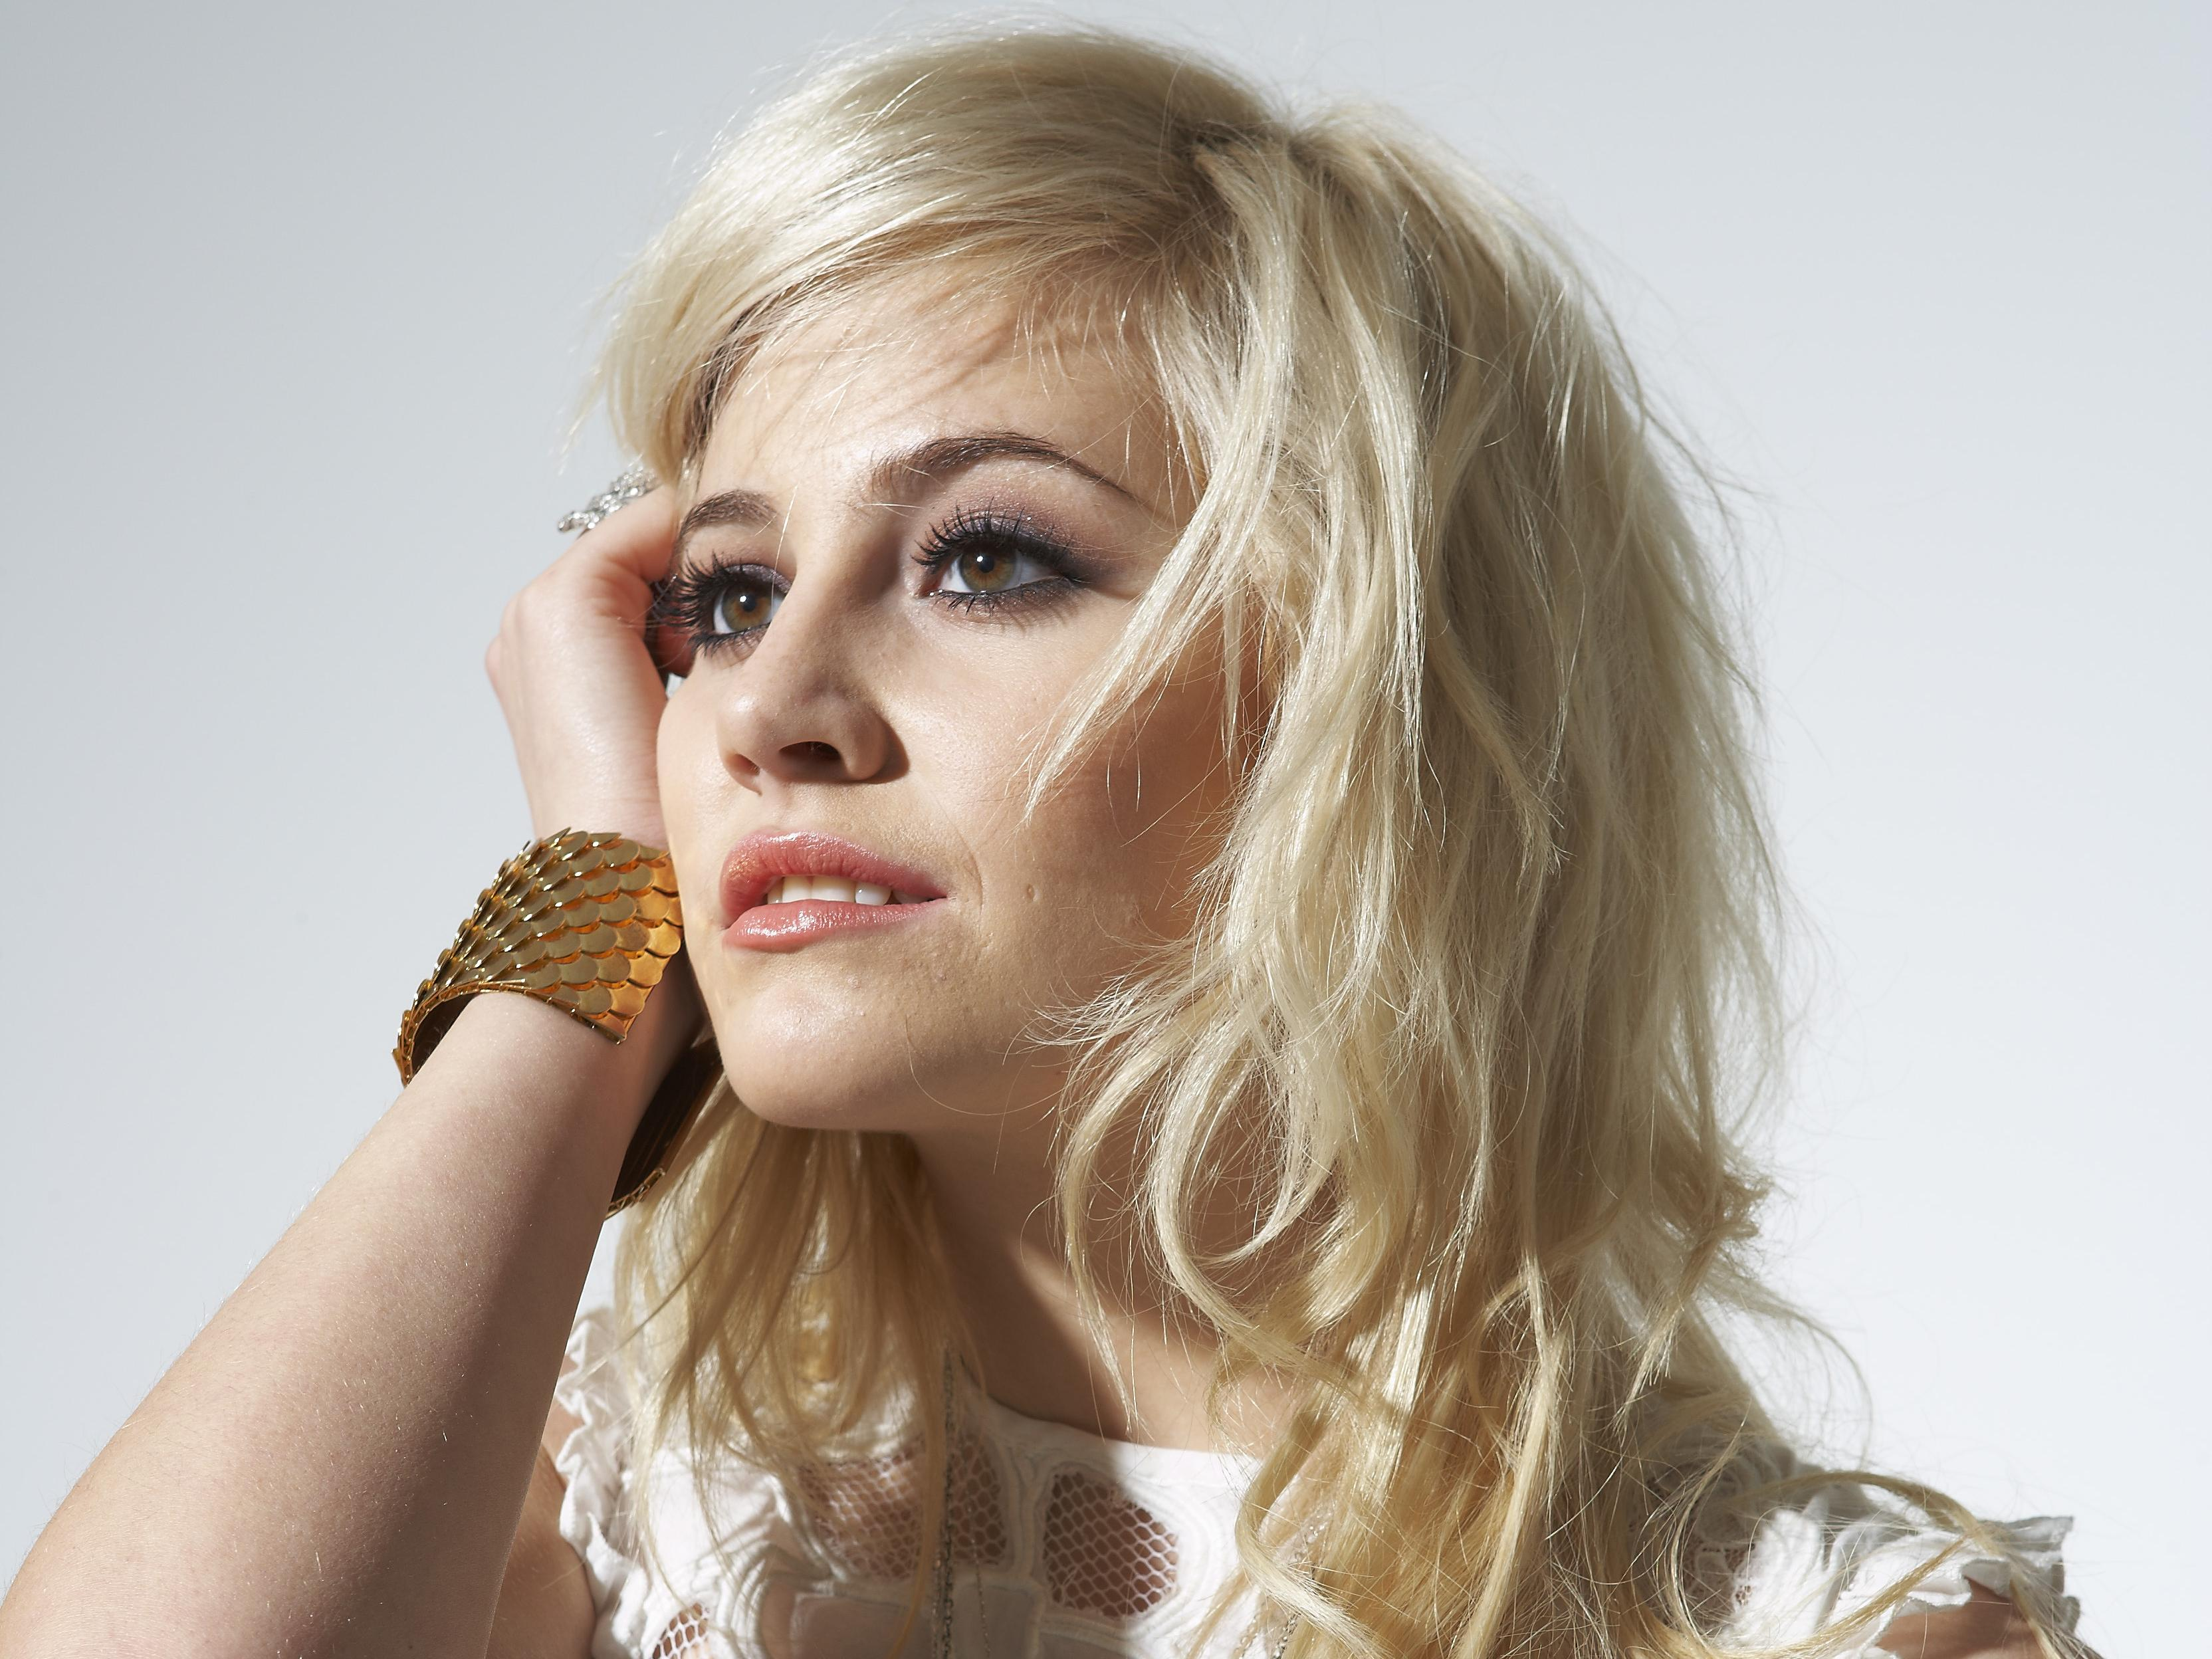 Blonde Singer Brown Eyes 3328x2496